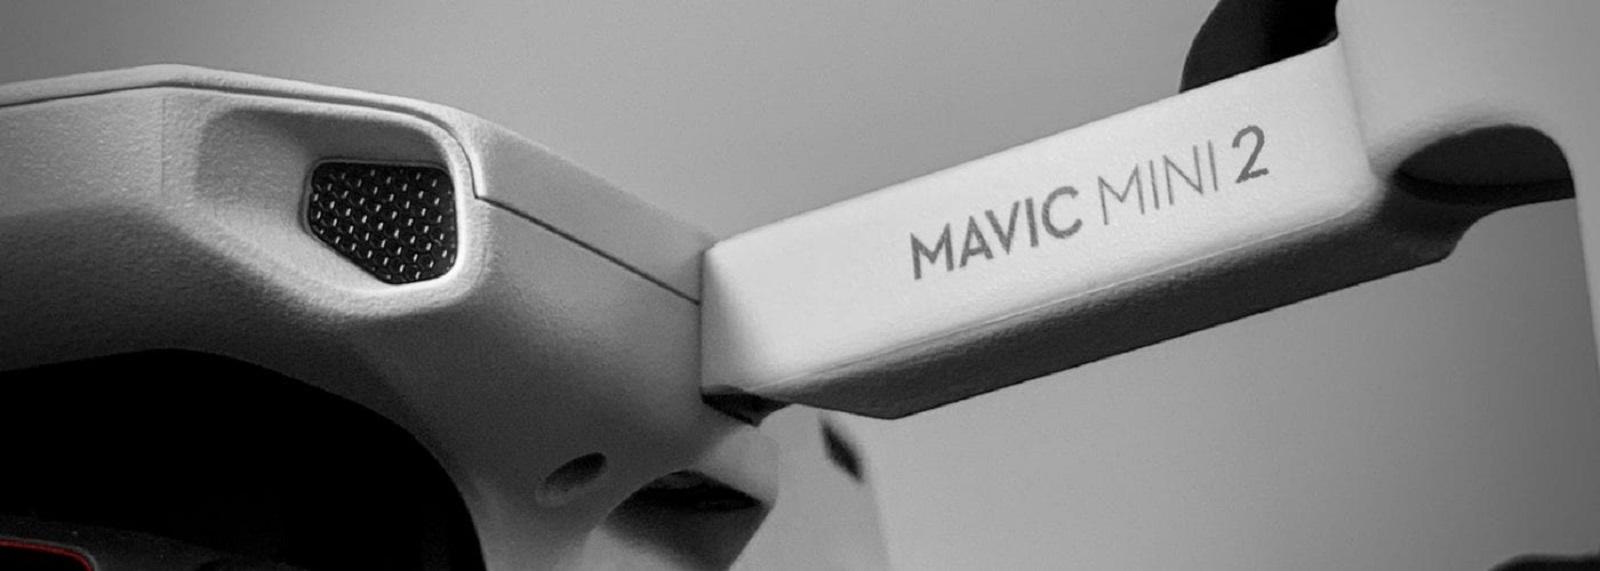 Mavic Mini 2 по цене 449 долларов и 599 долларов за Fly More Combo